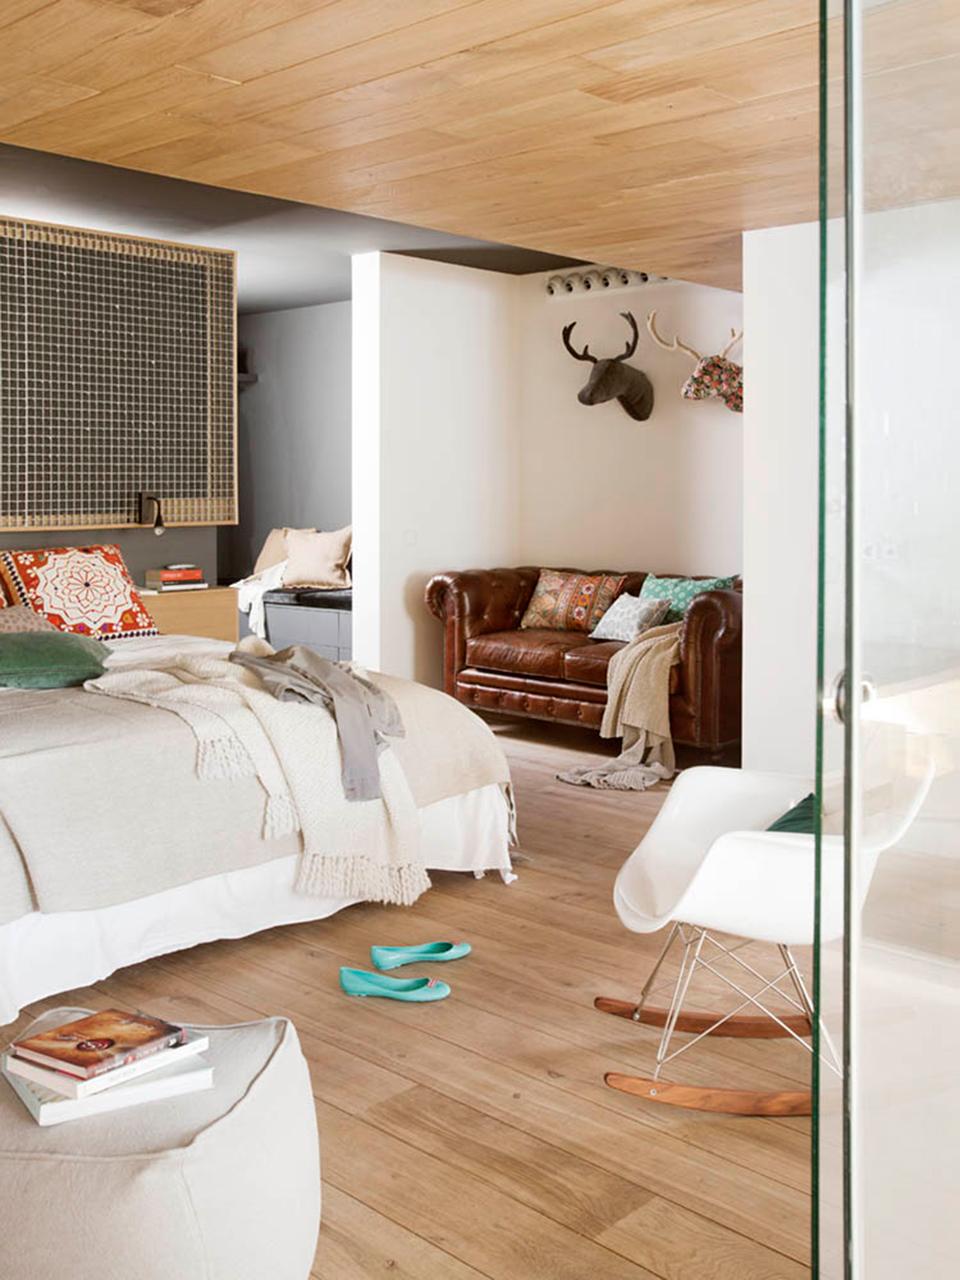 casa-madeira-industrial-decoracao-moveis-13